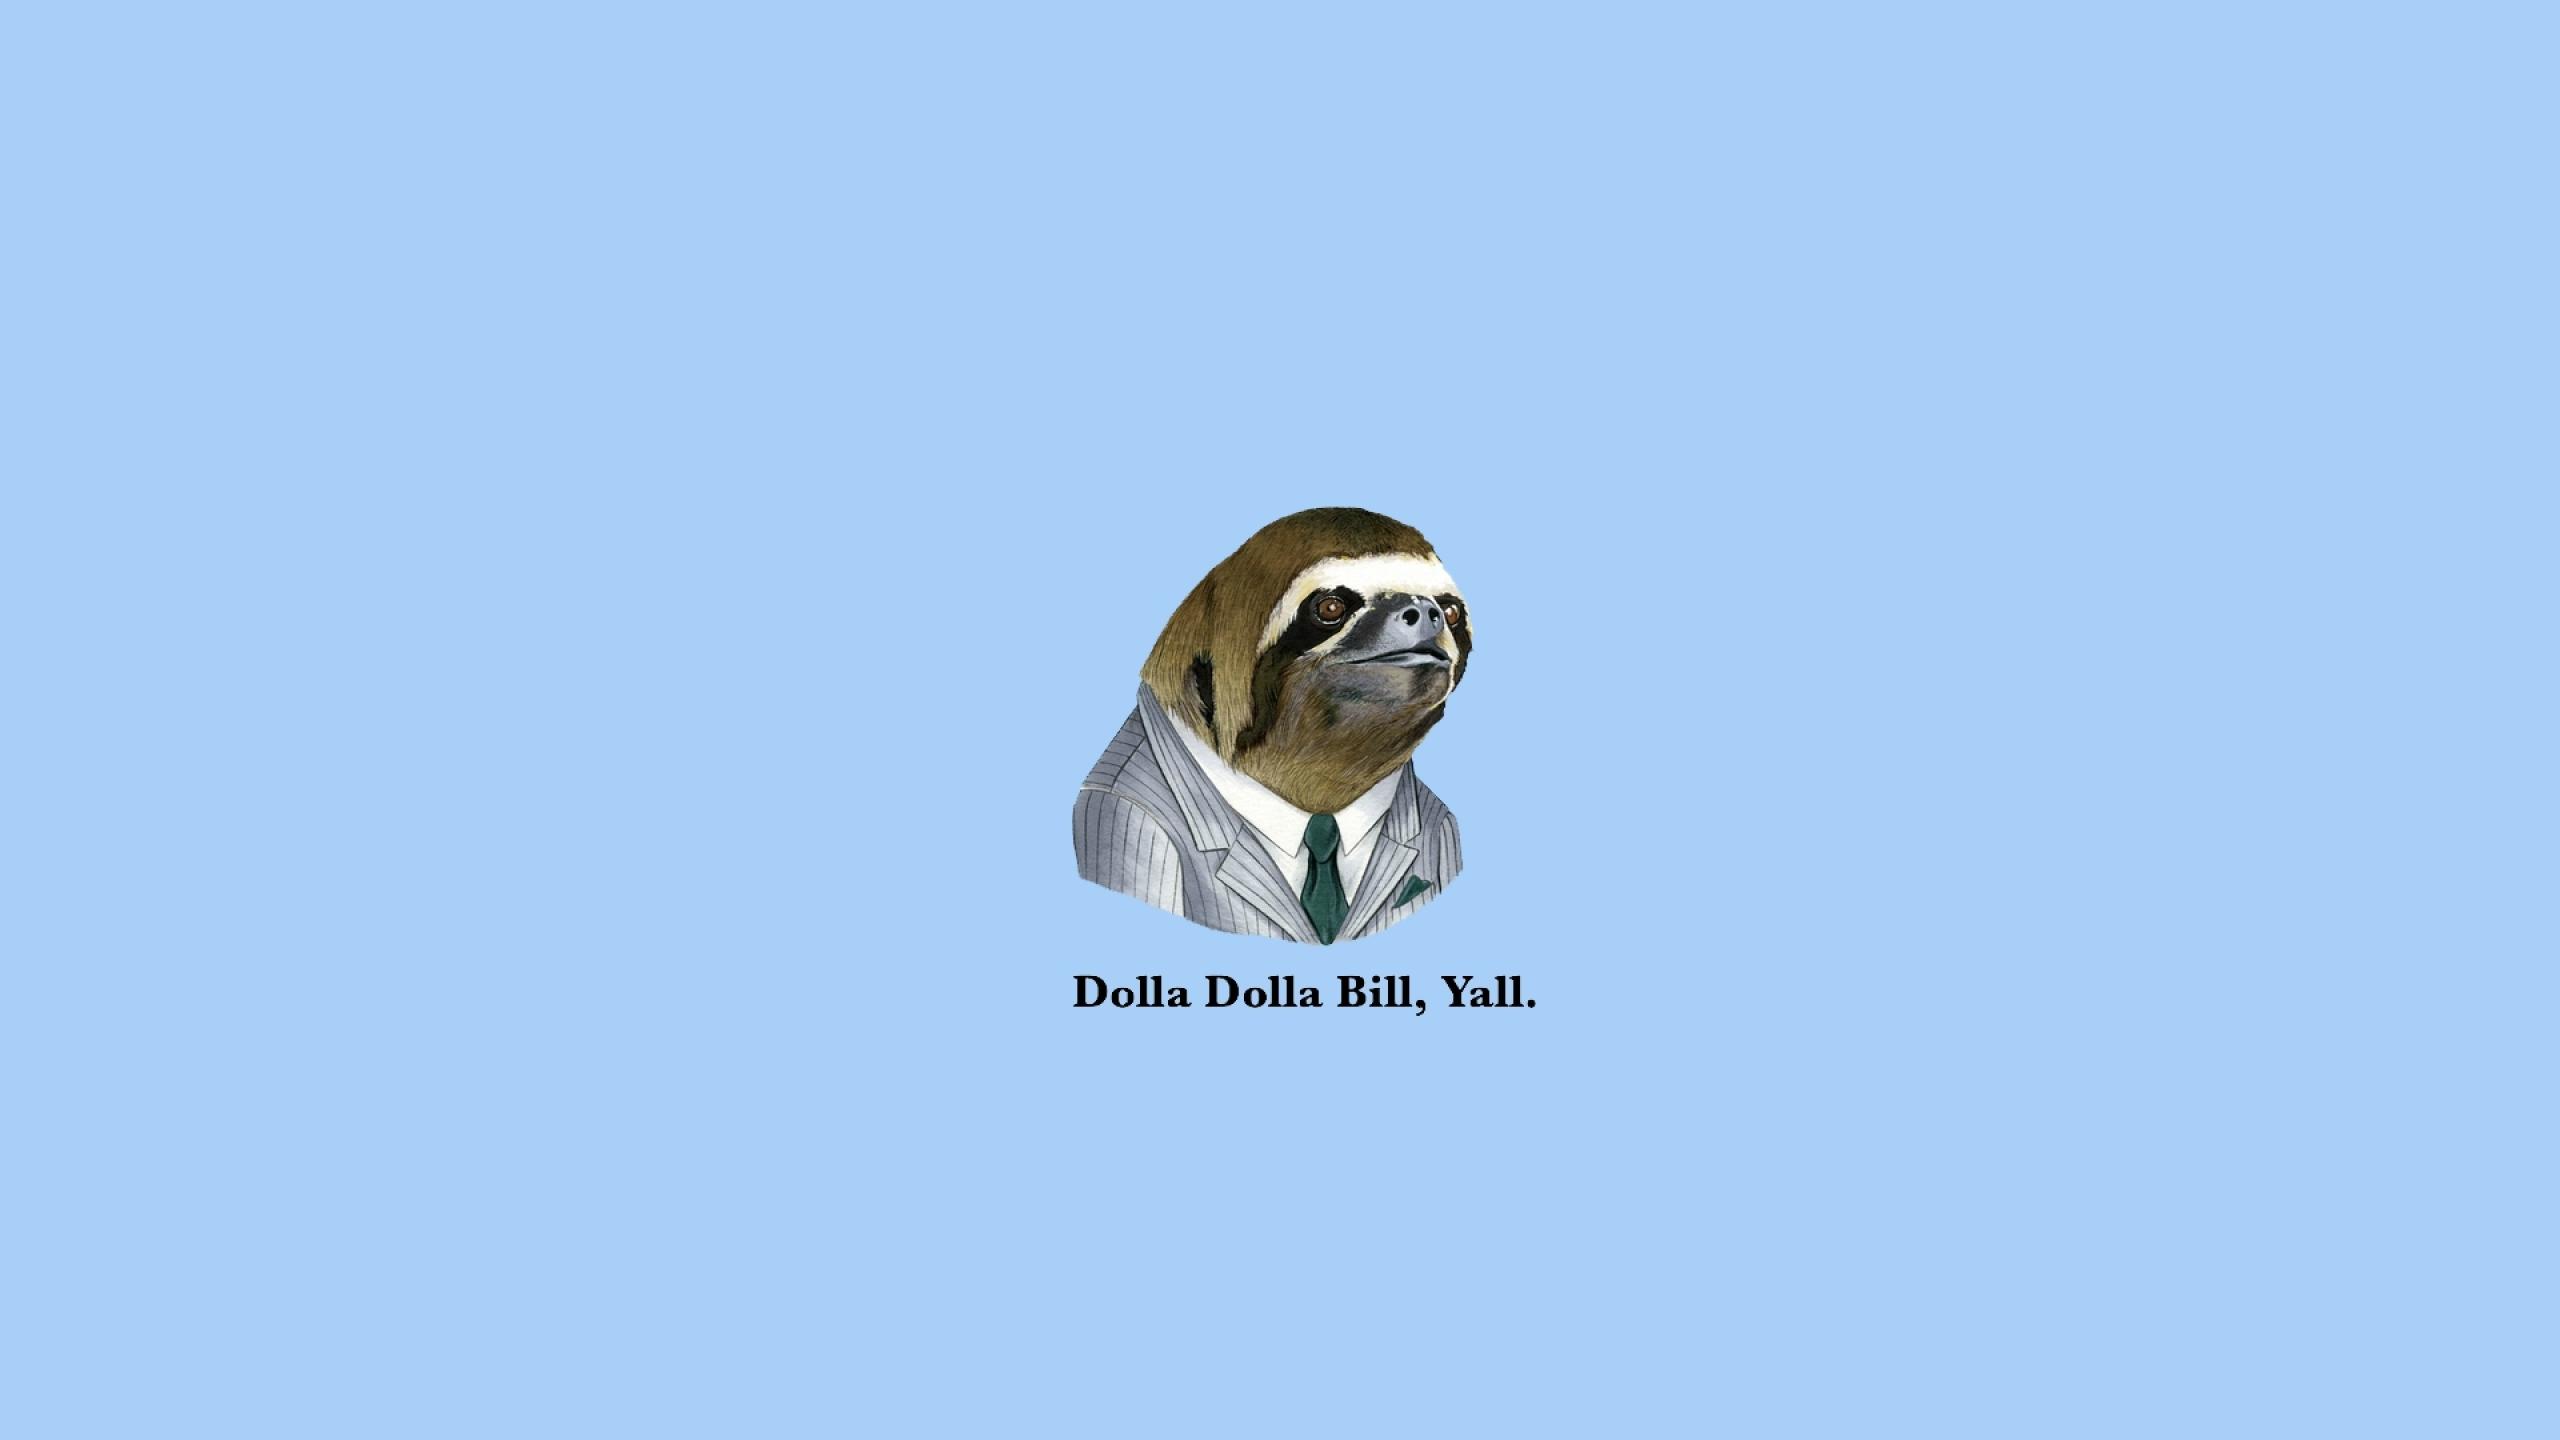 Koala Quotes Wallpapers Free Download Sloth Wallpapers Pixelstalk Net